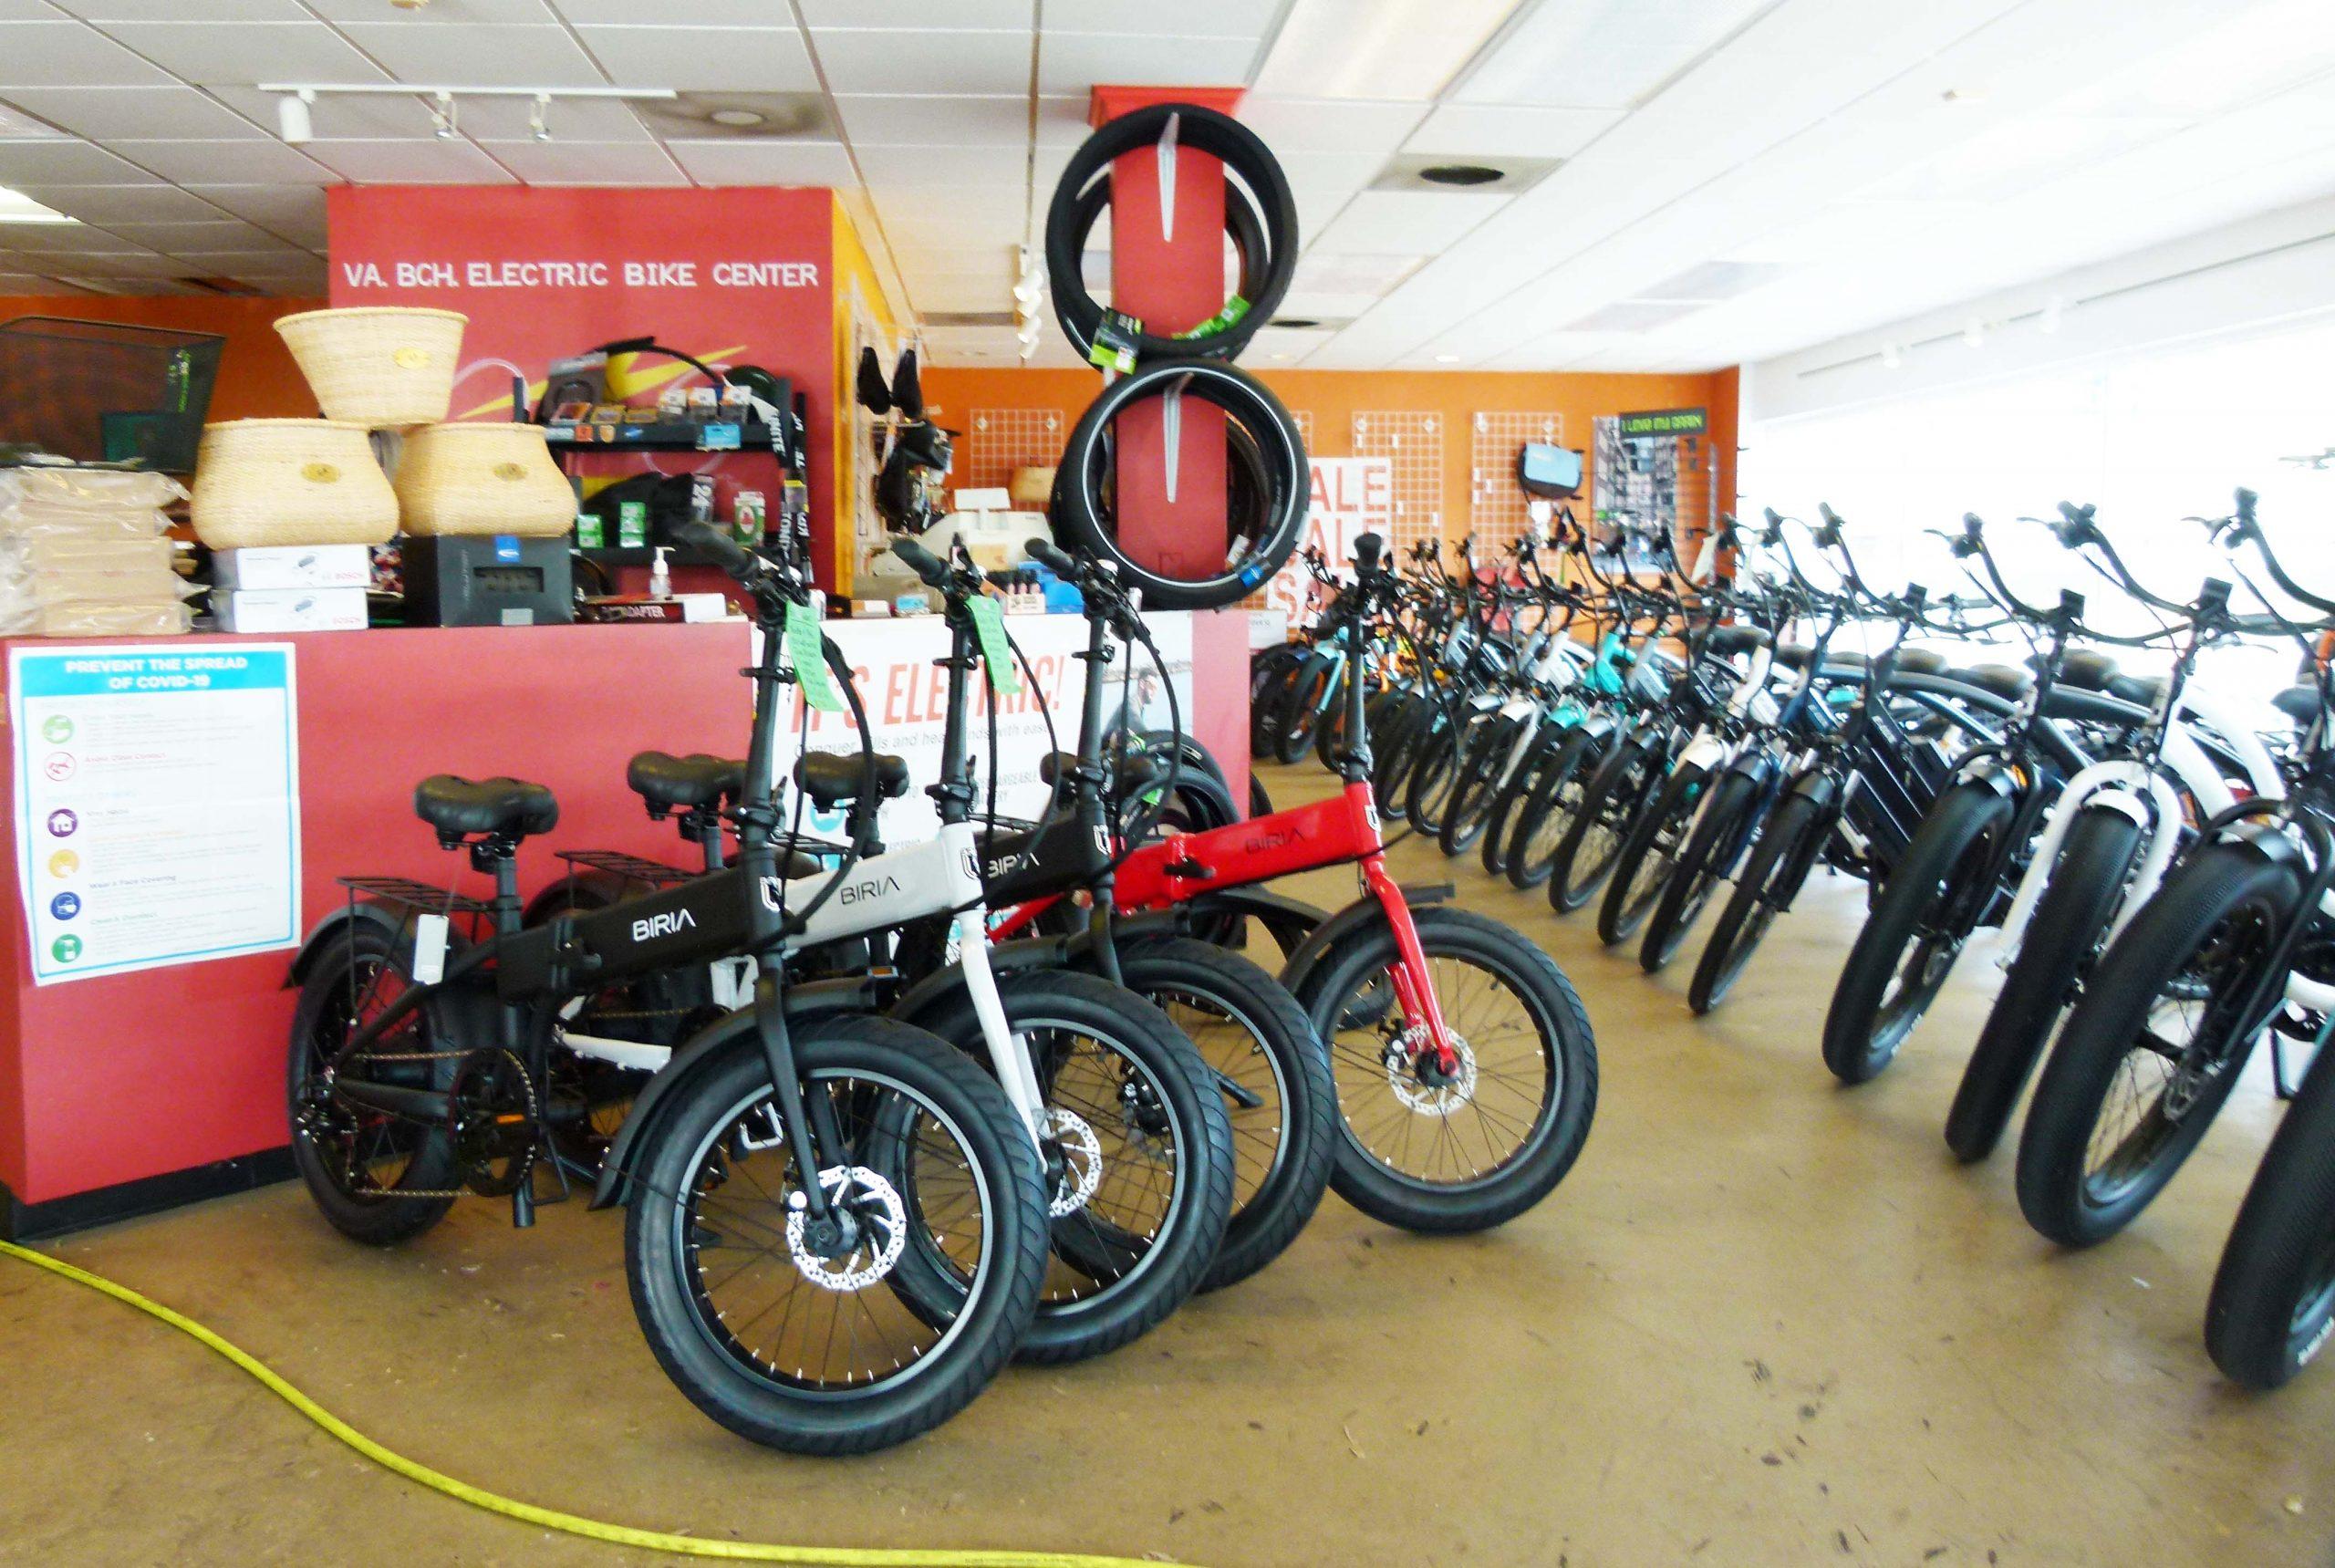 Front Counter of Virginia Beach Electric Bike Center